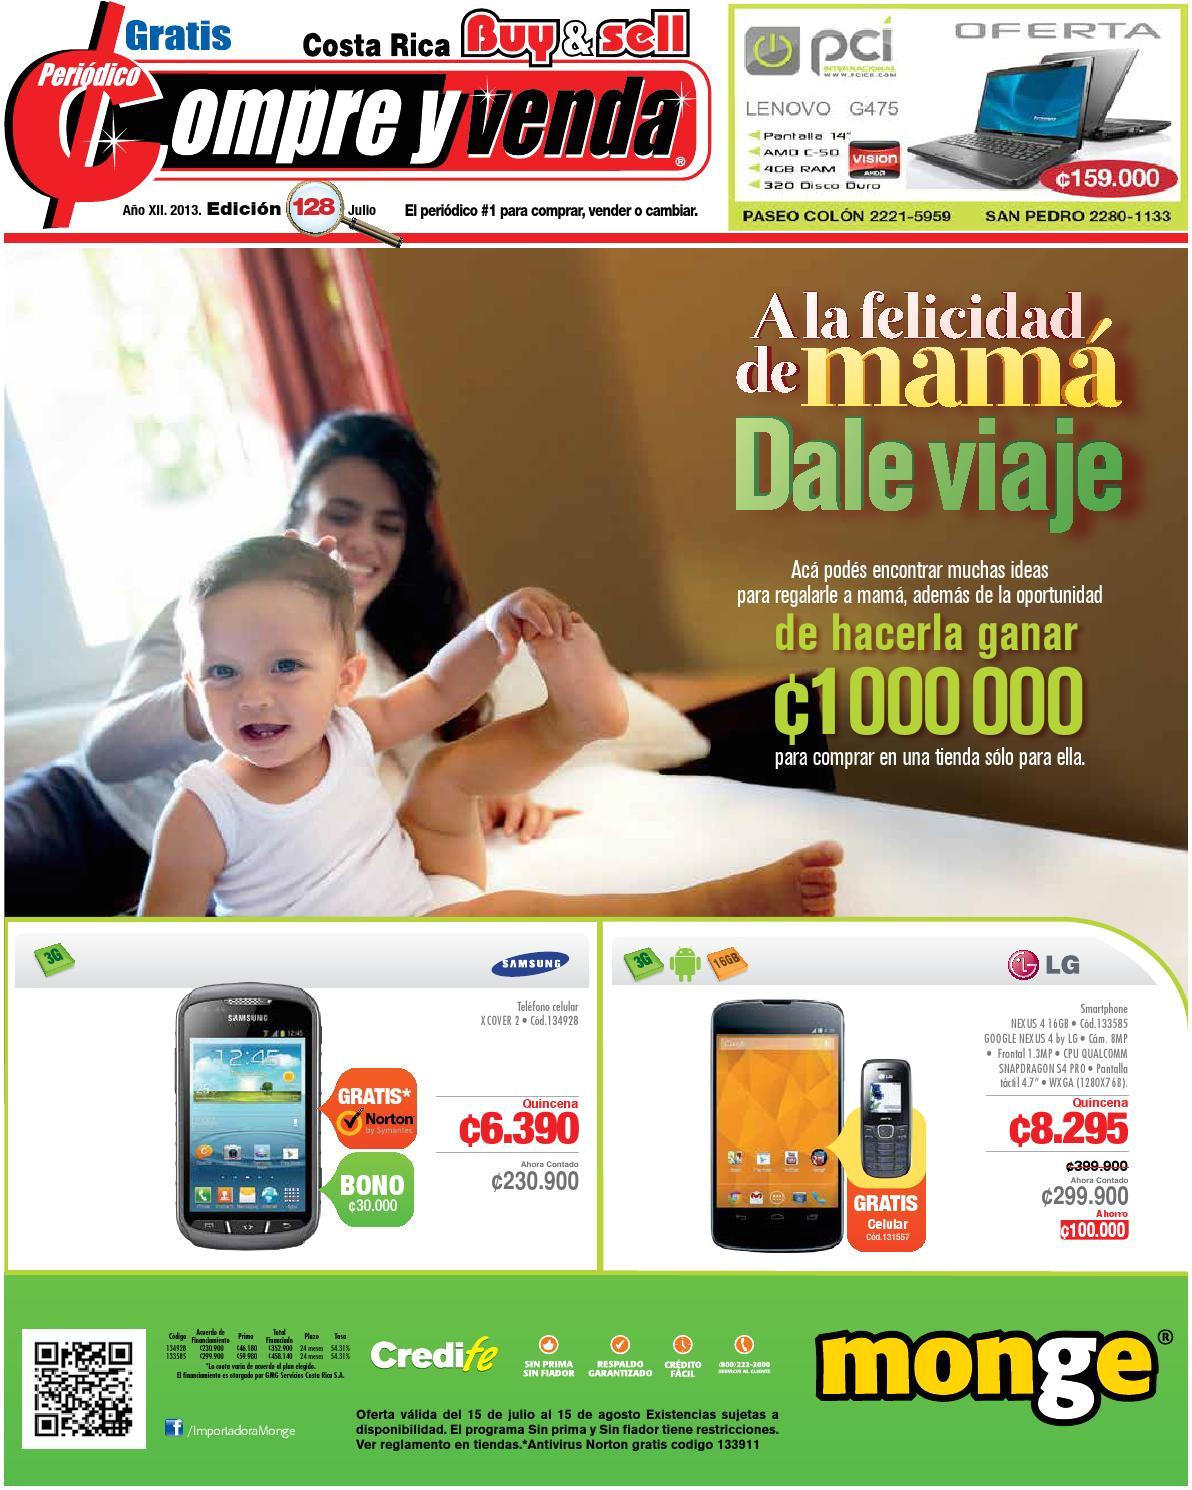 peria dico compre y venda edi 128 julio 2013 by magic medias s a issuu